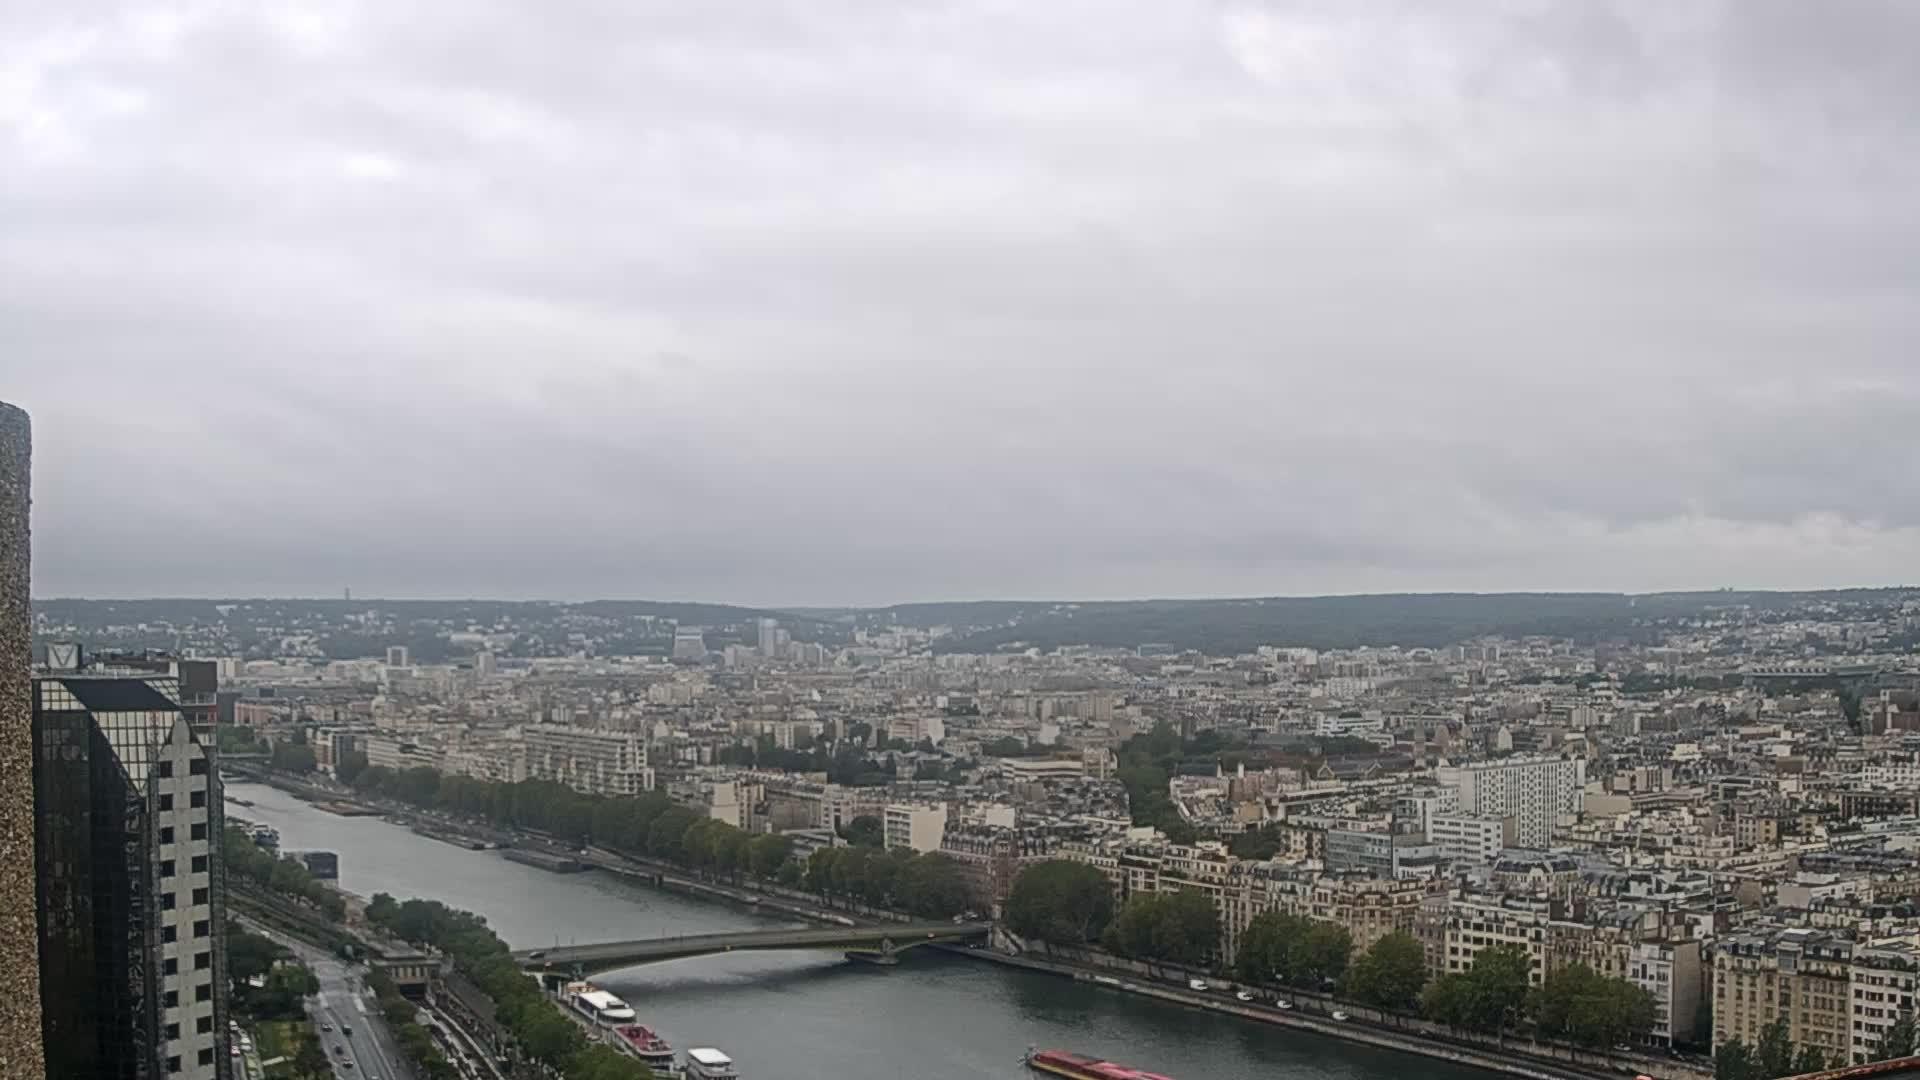 Paris Sat. 08:23